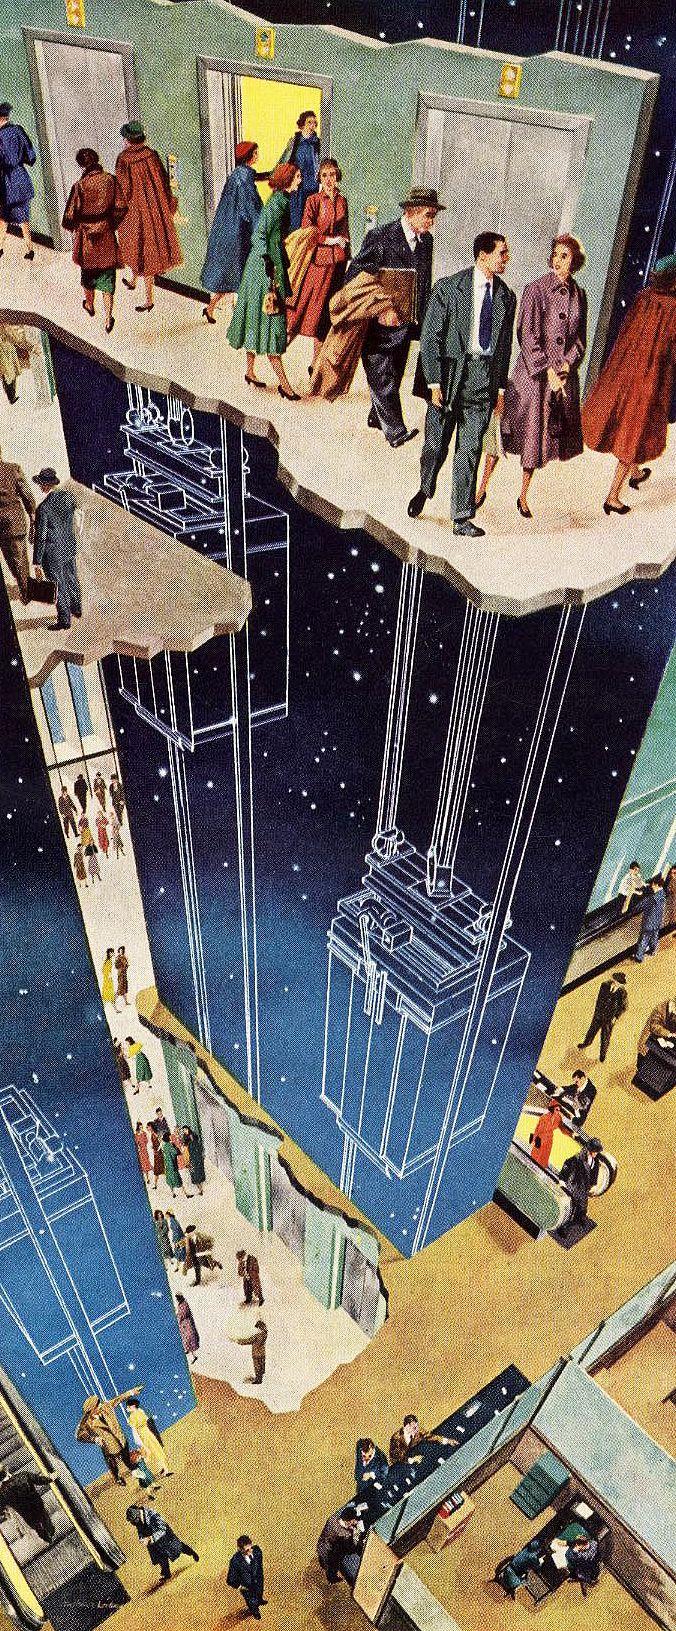 1952 Otis Elevator ad.